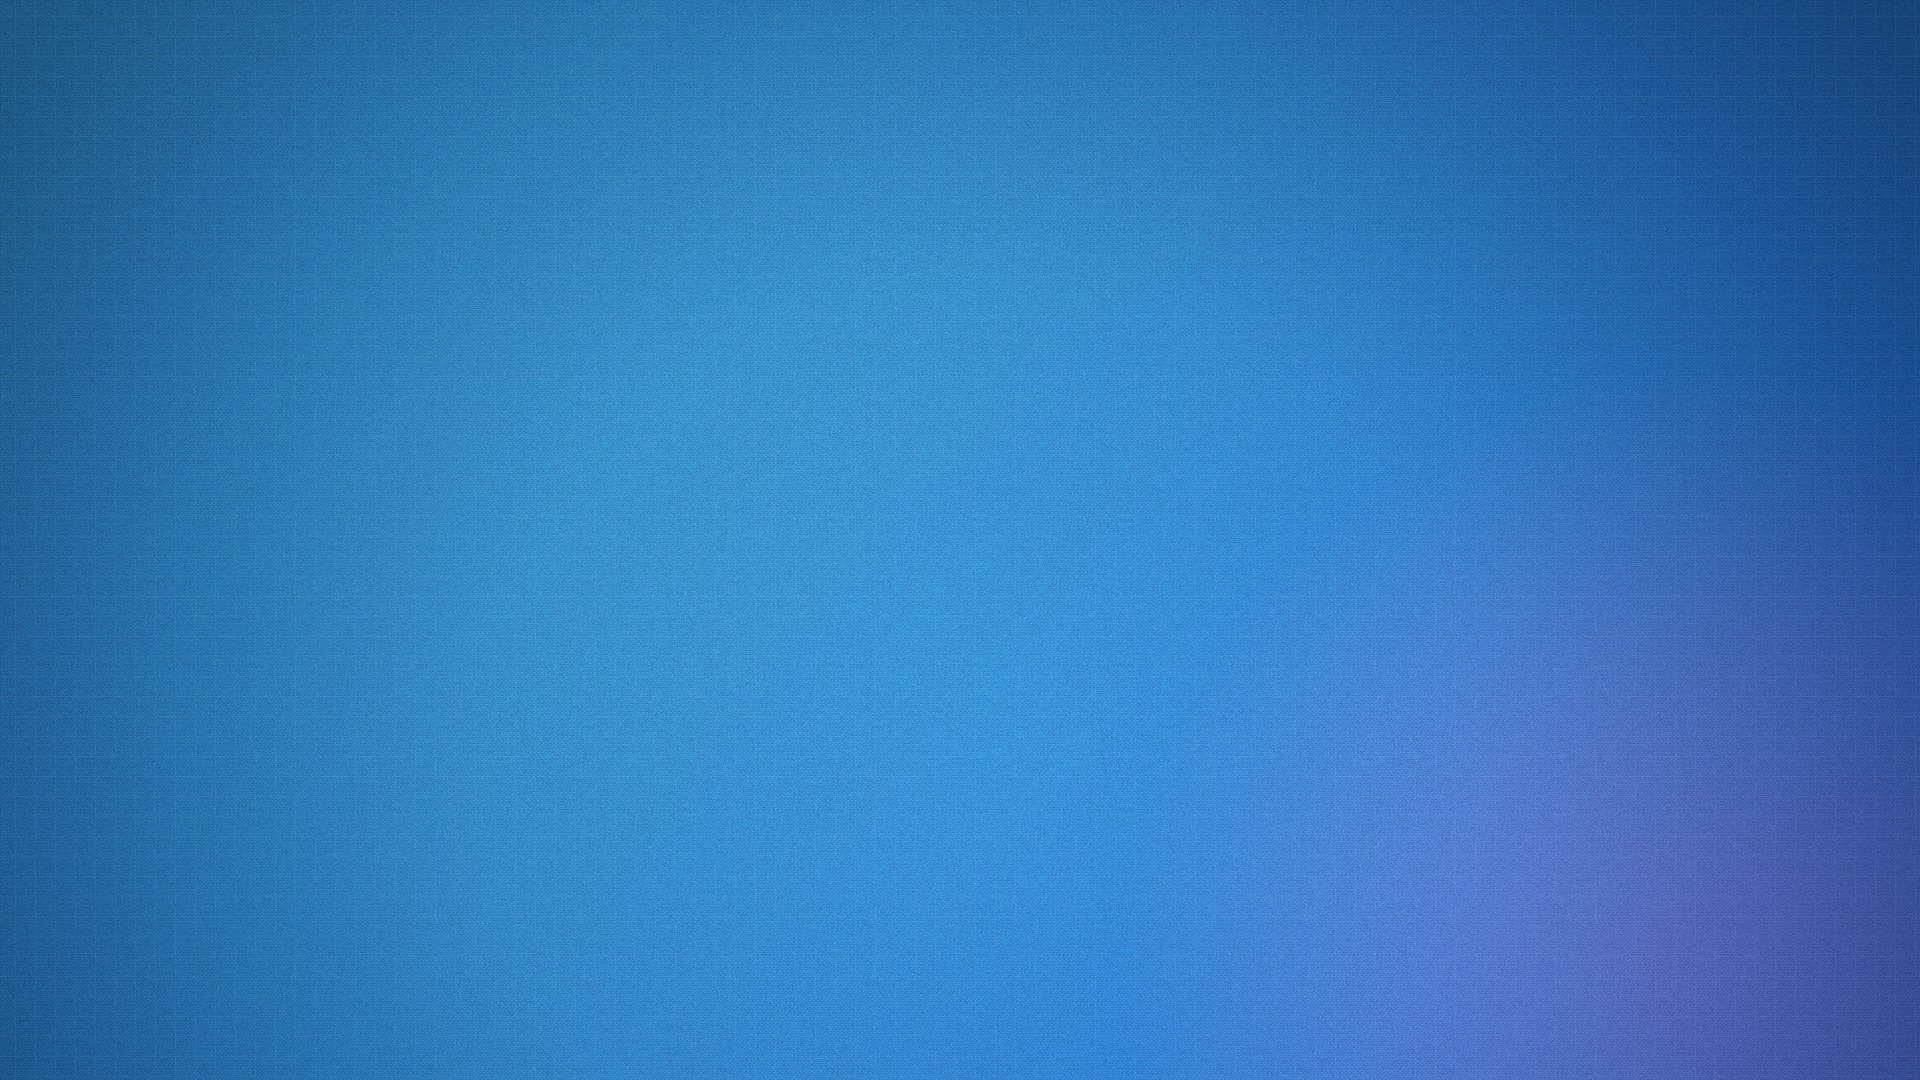 Light Blue Background Design wallpaper 122174 1920x1080